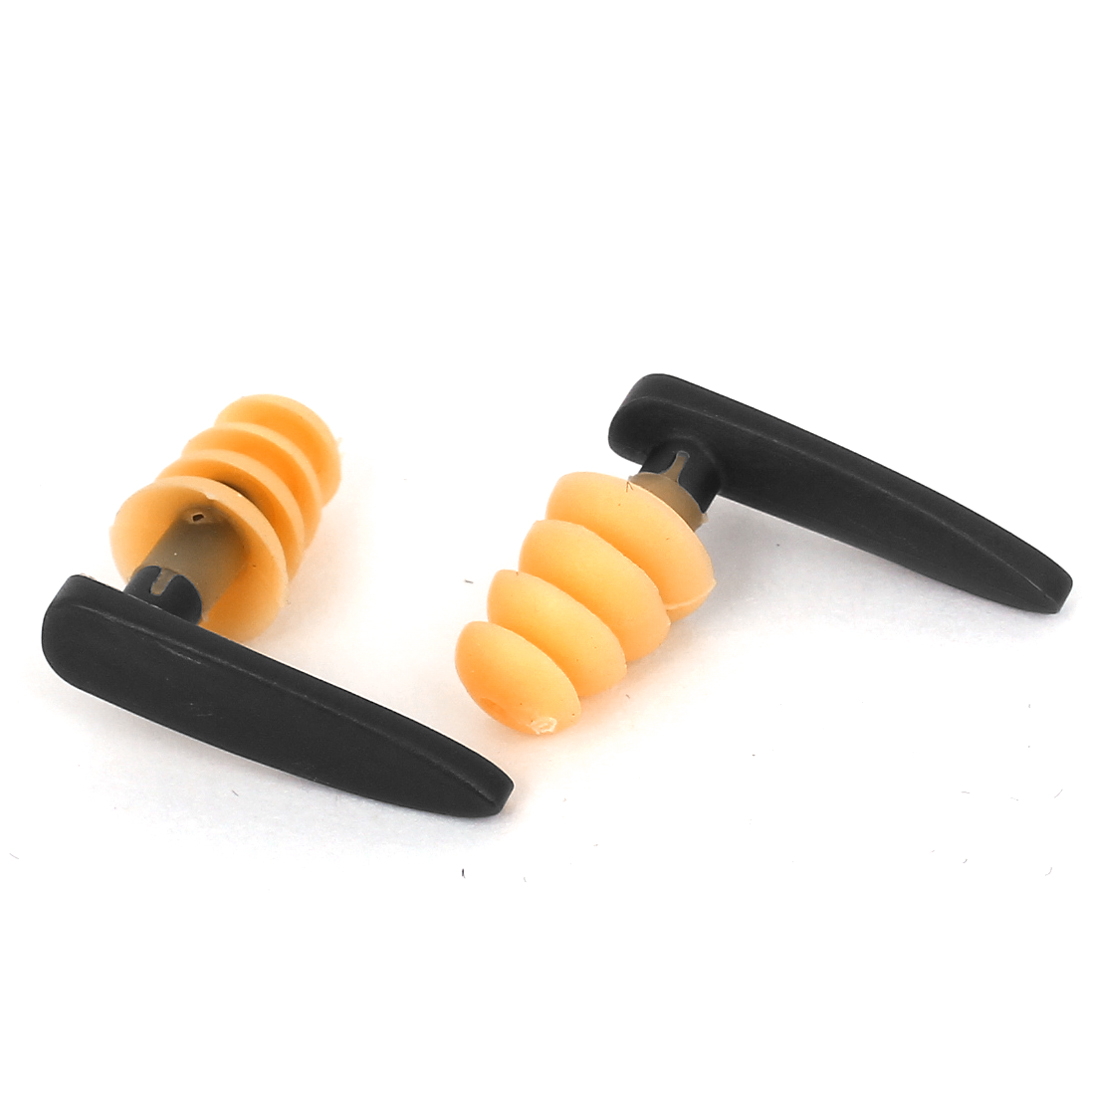 Mushroom Design Travel Swim Swimming Guard Earplugs Orange Gray Pair w Case